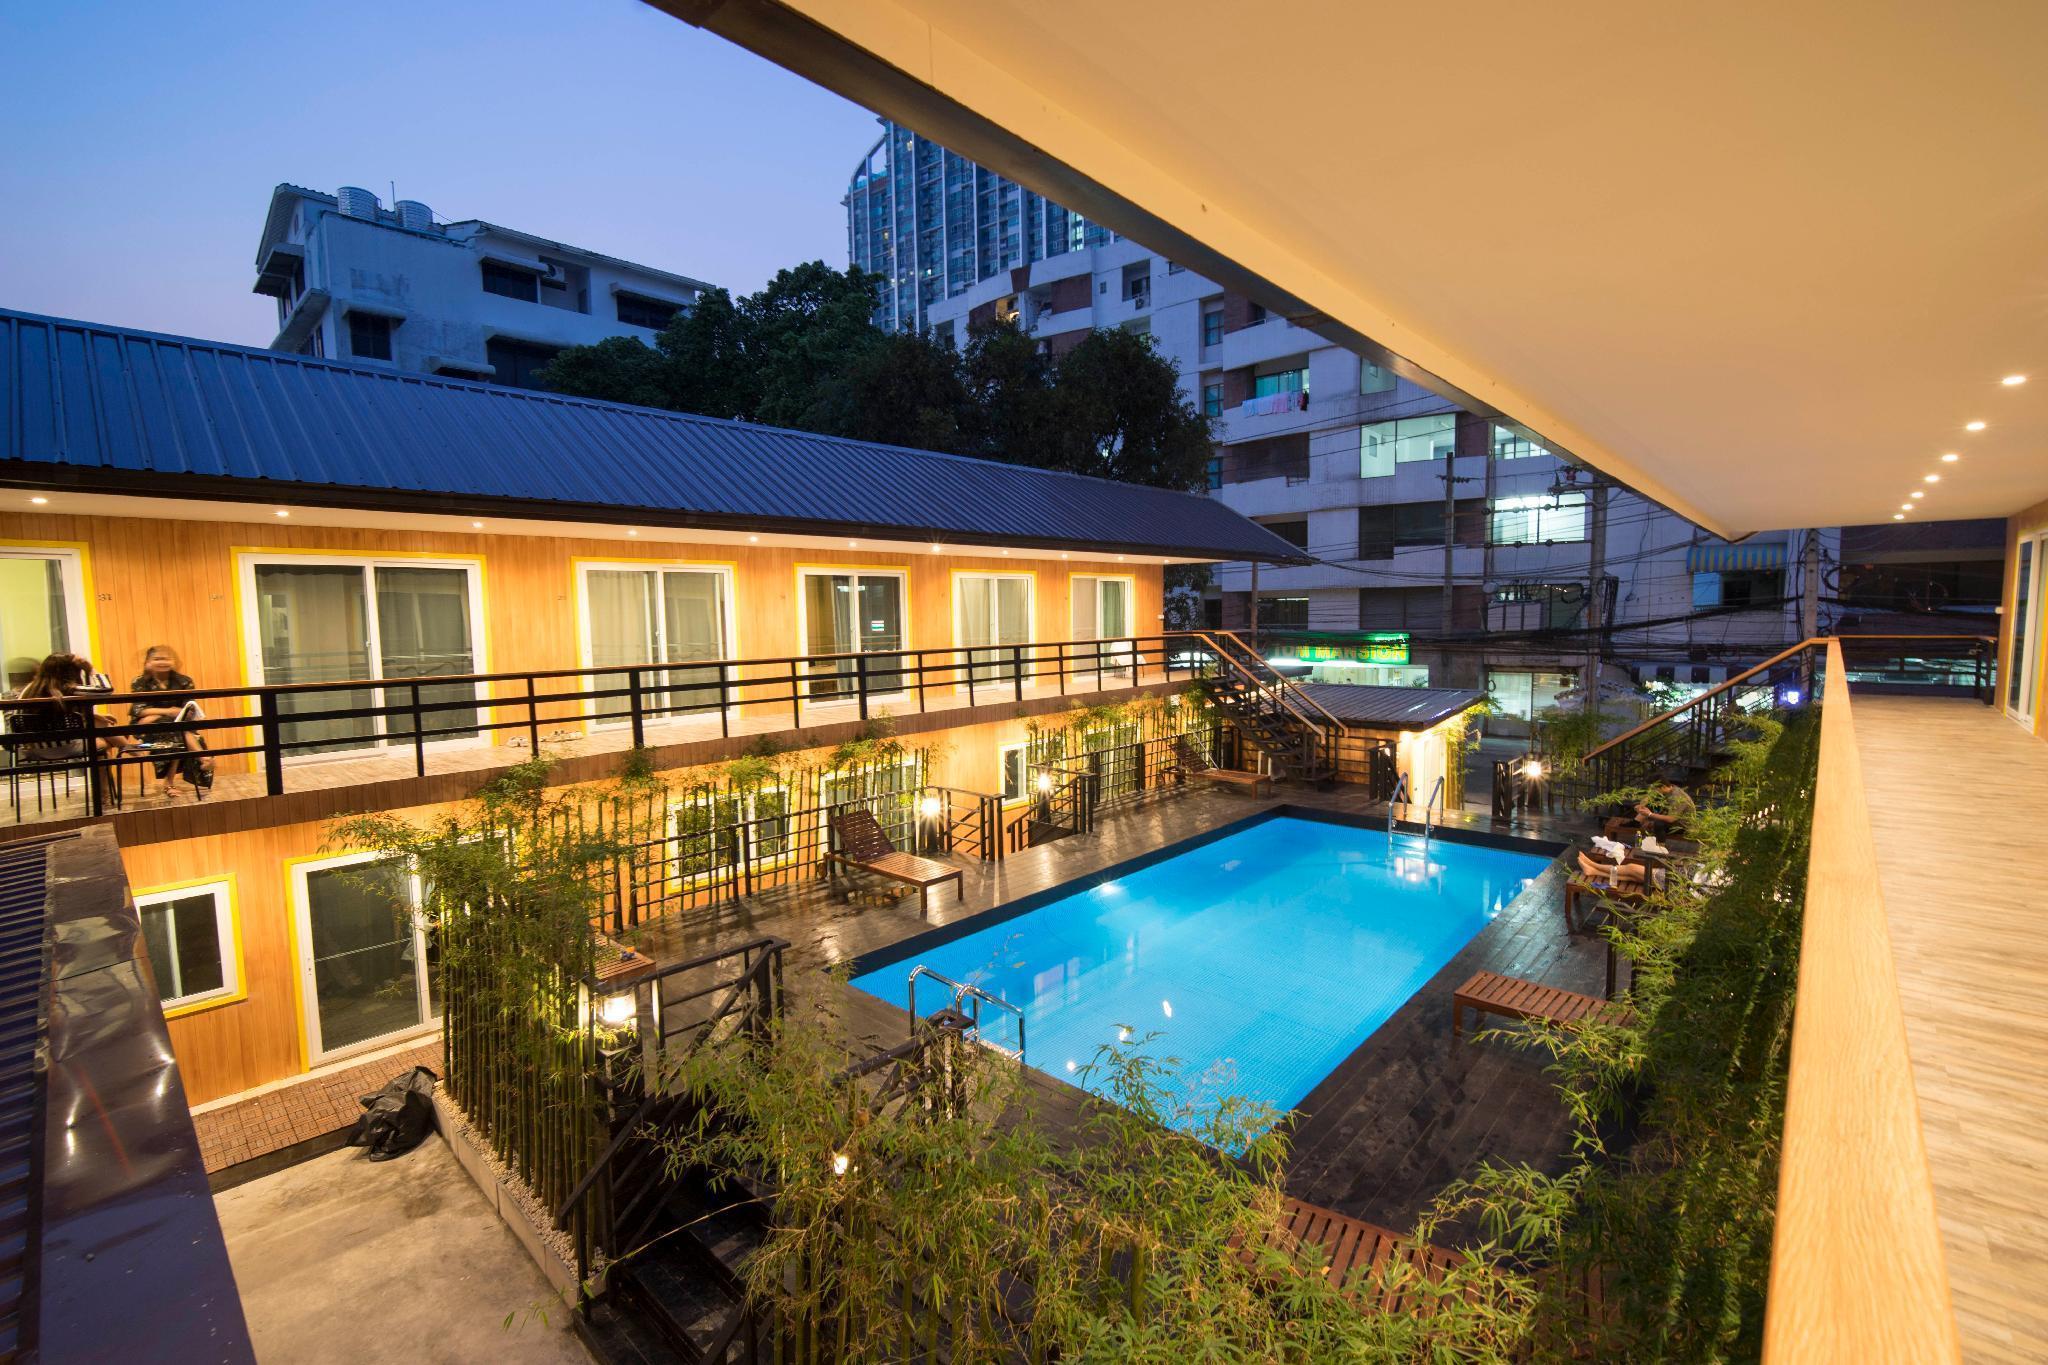 Resort M - MRT Huai Khwang รีสอร์ต เอ็ม - เอ็มอาร์ที ห้วยขวาง